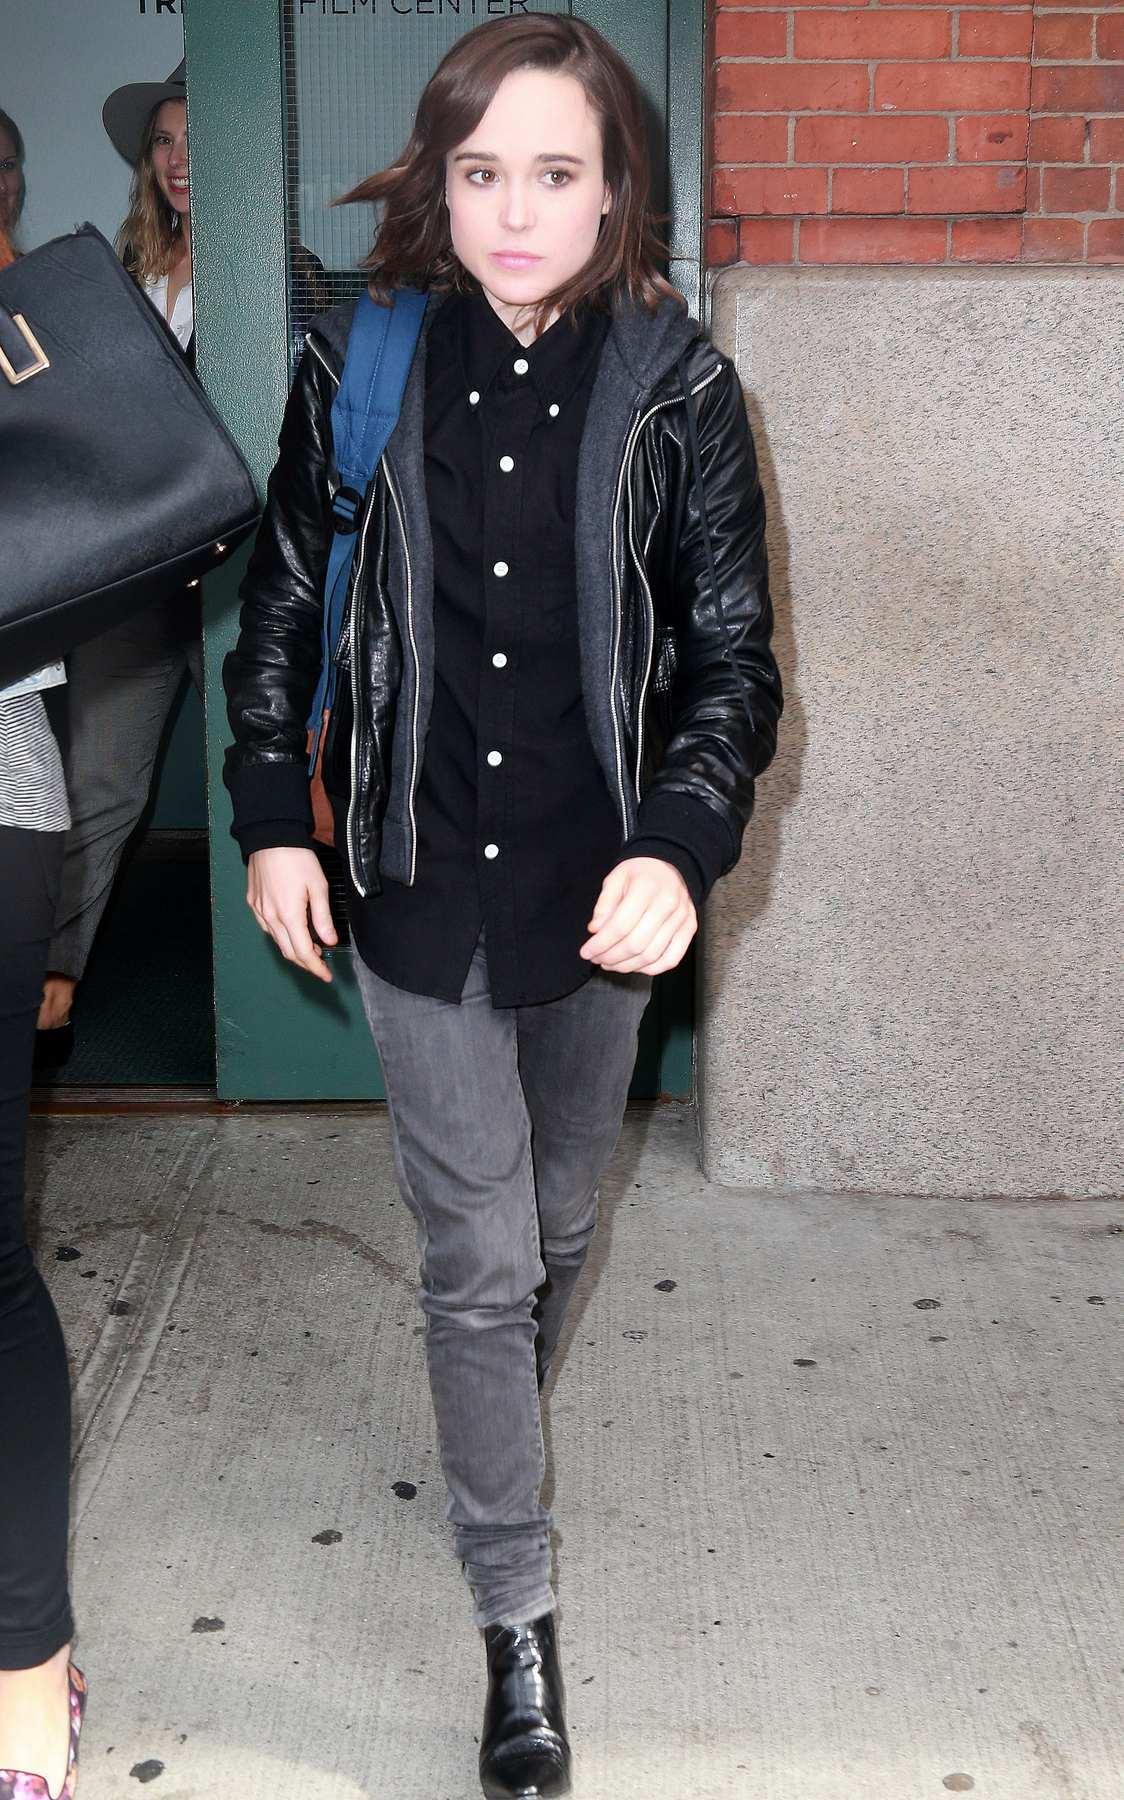 Ellen Page Leaving Tribeca Film Center-1